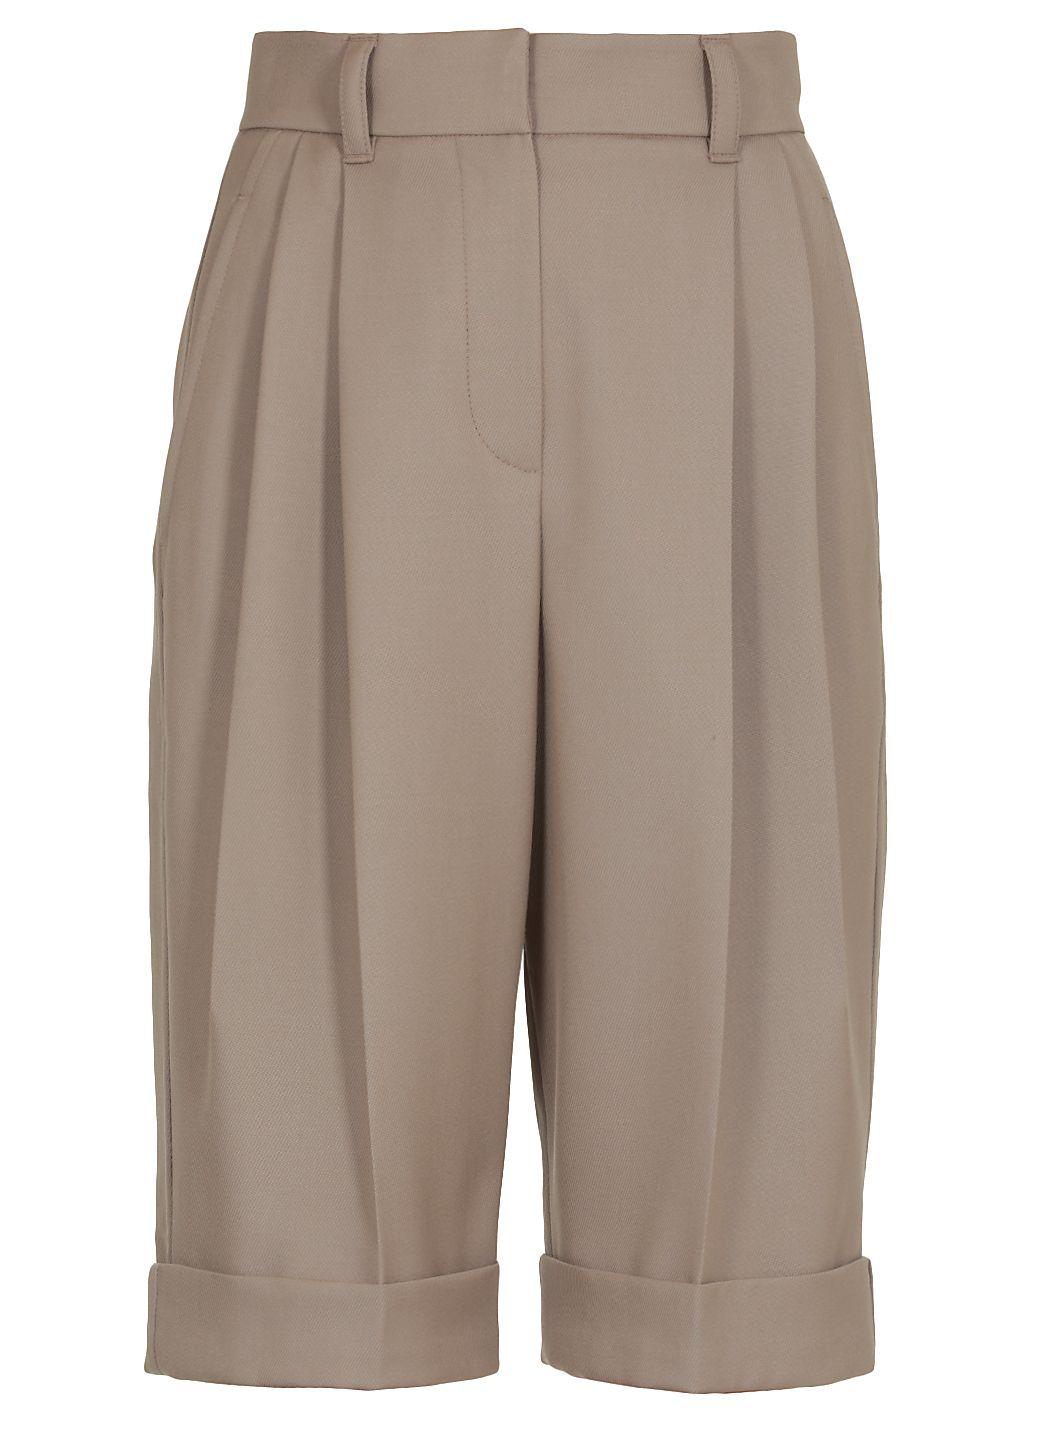 Baggy Bermuda shorts